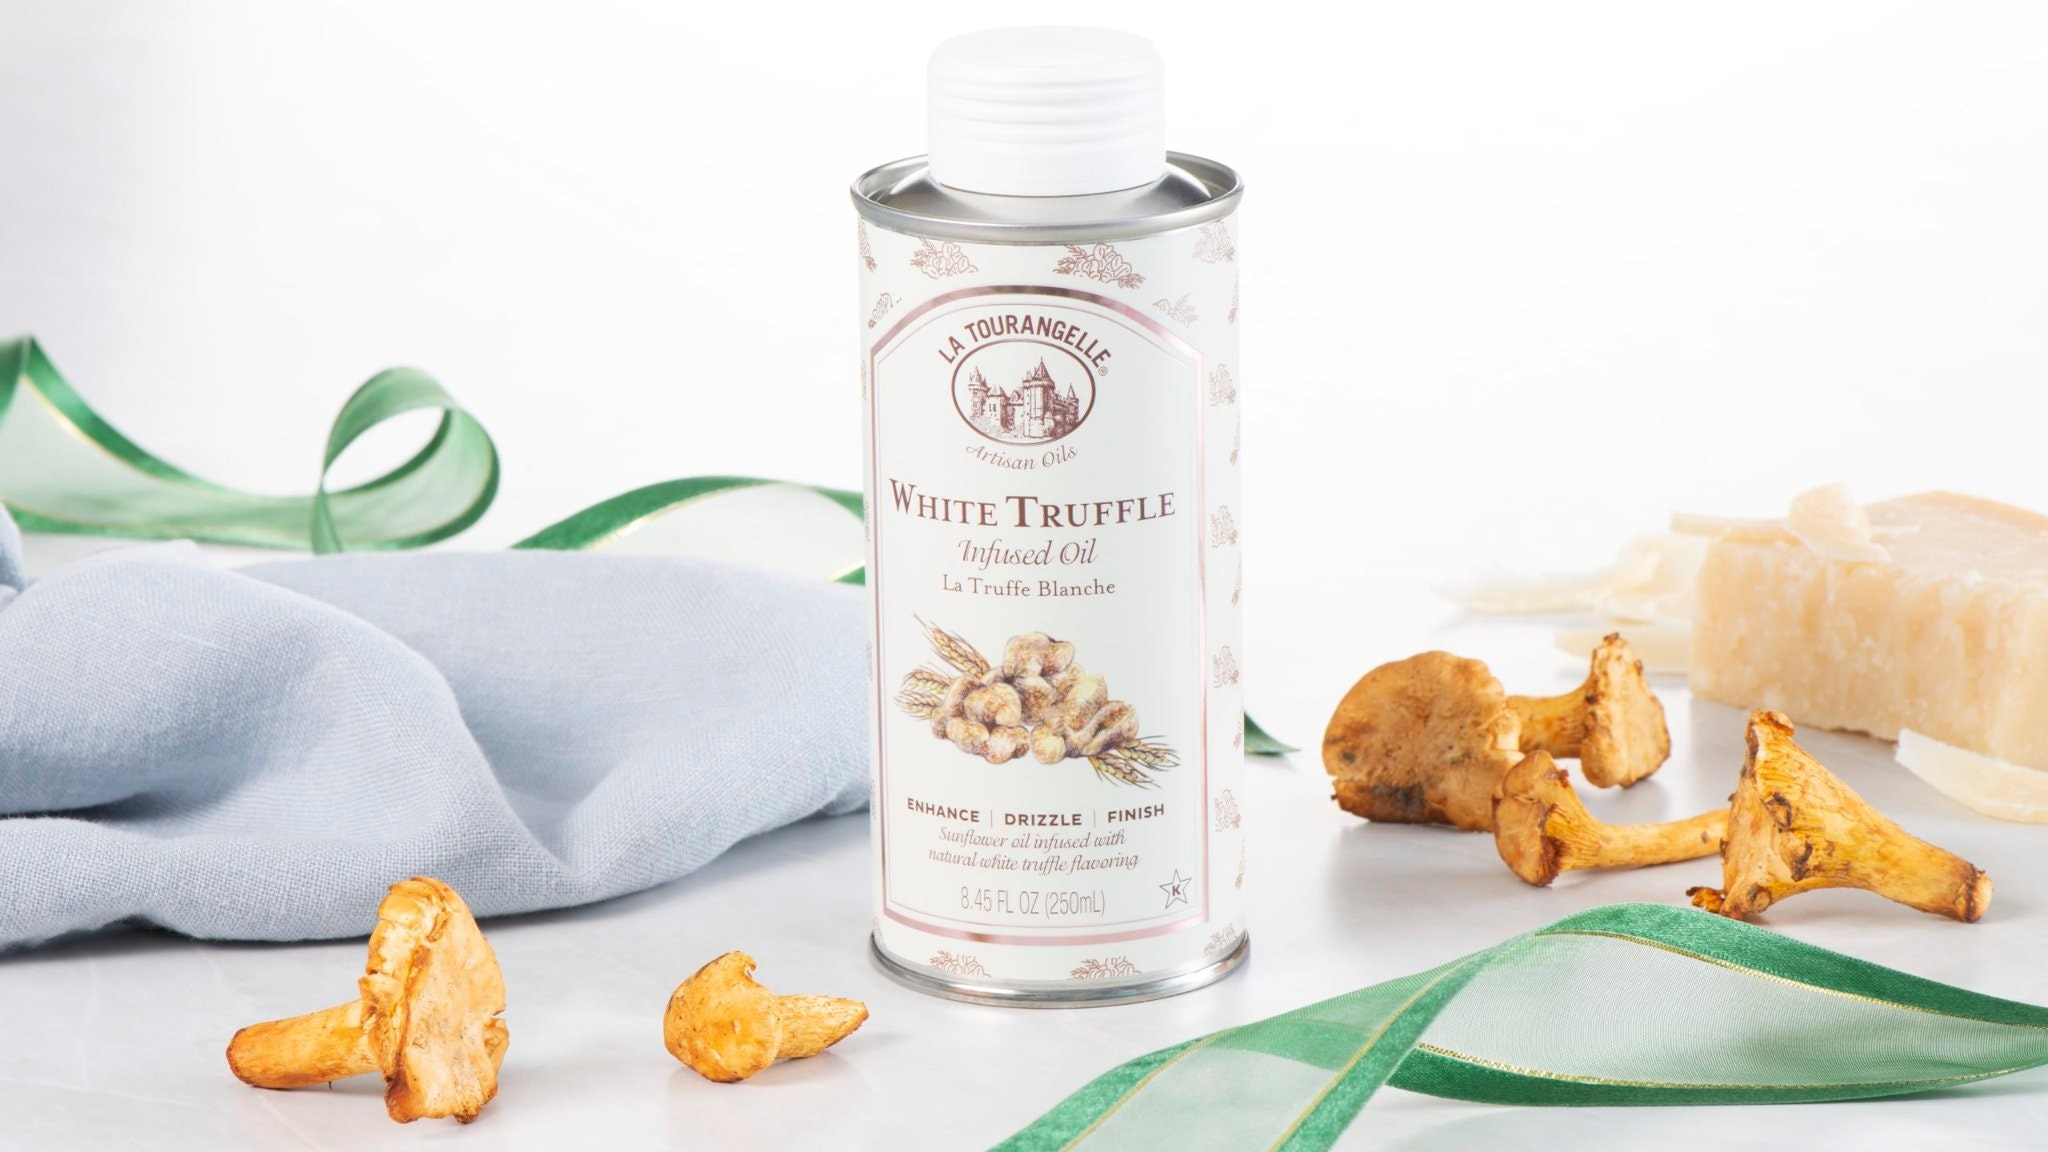 La Tourangelle White-Truffle-Infused Sunflower Oil